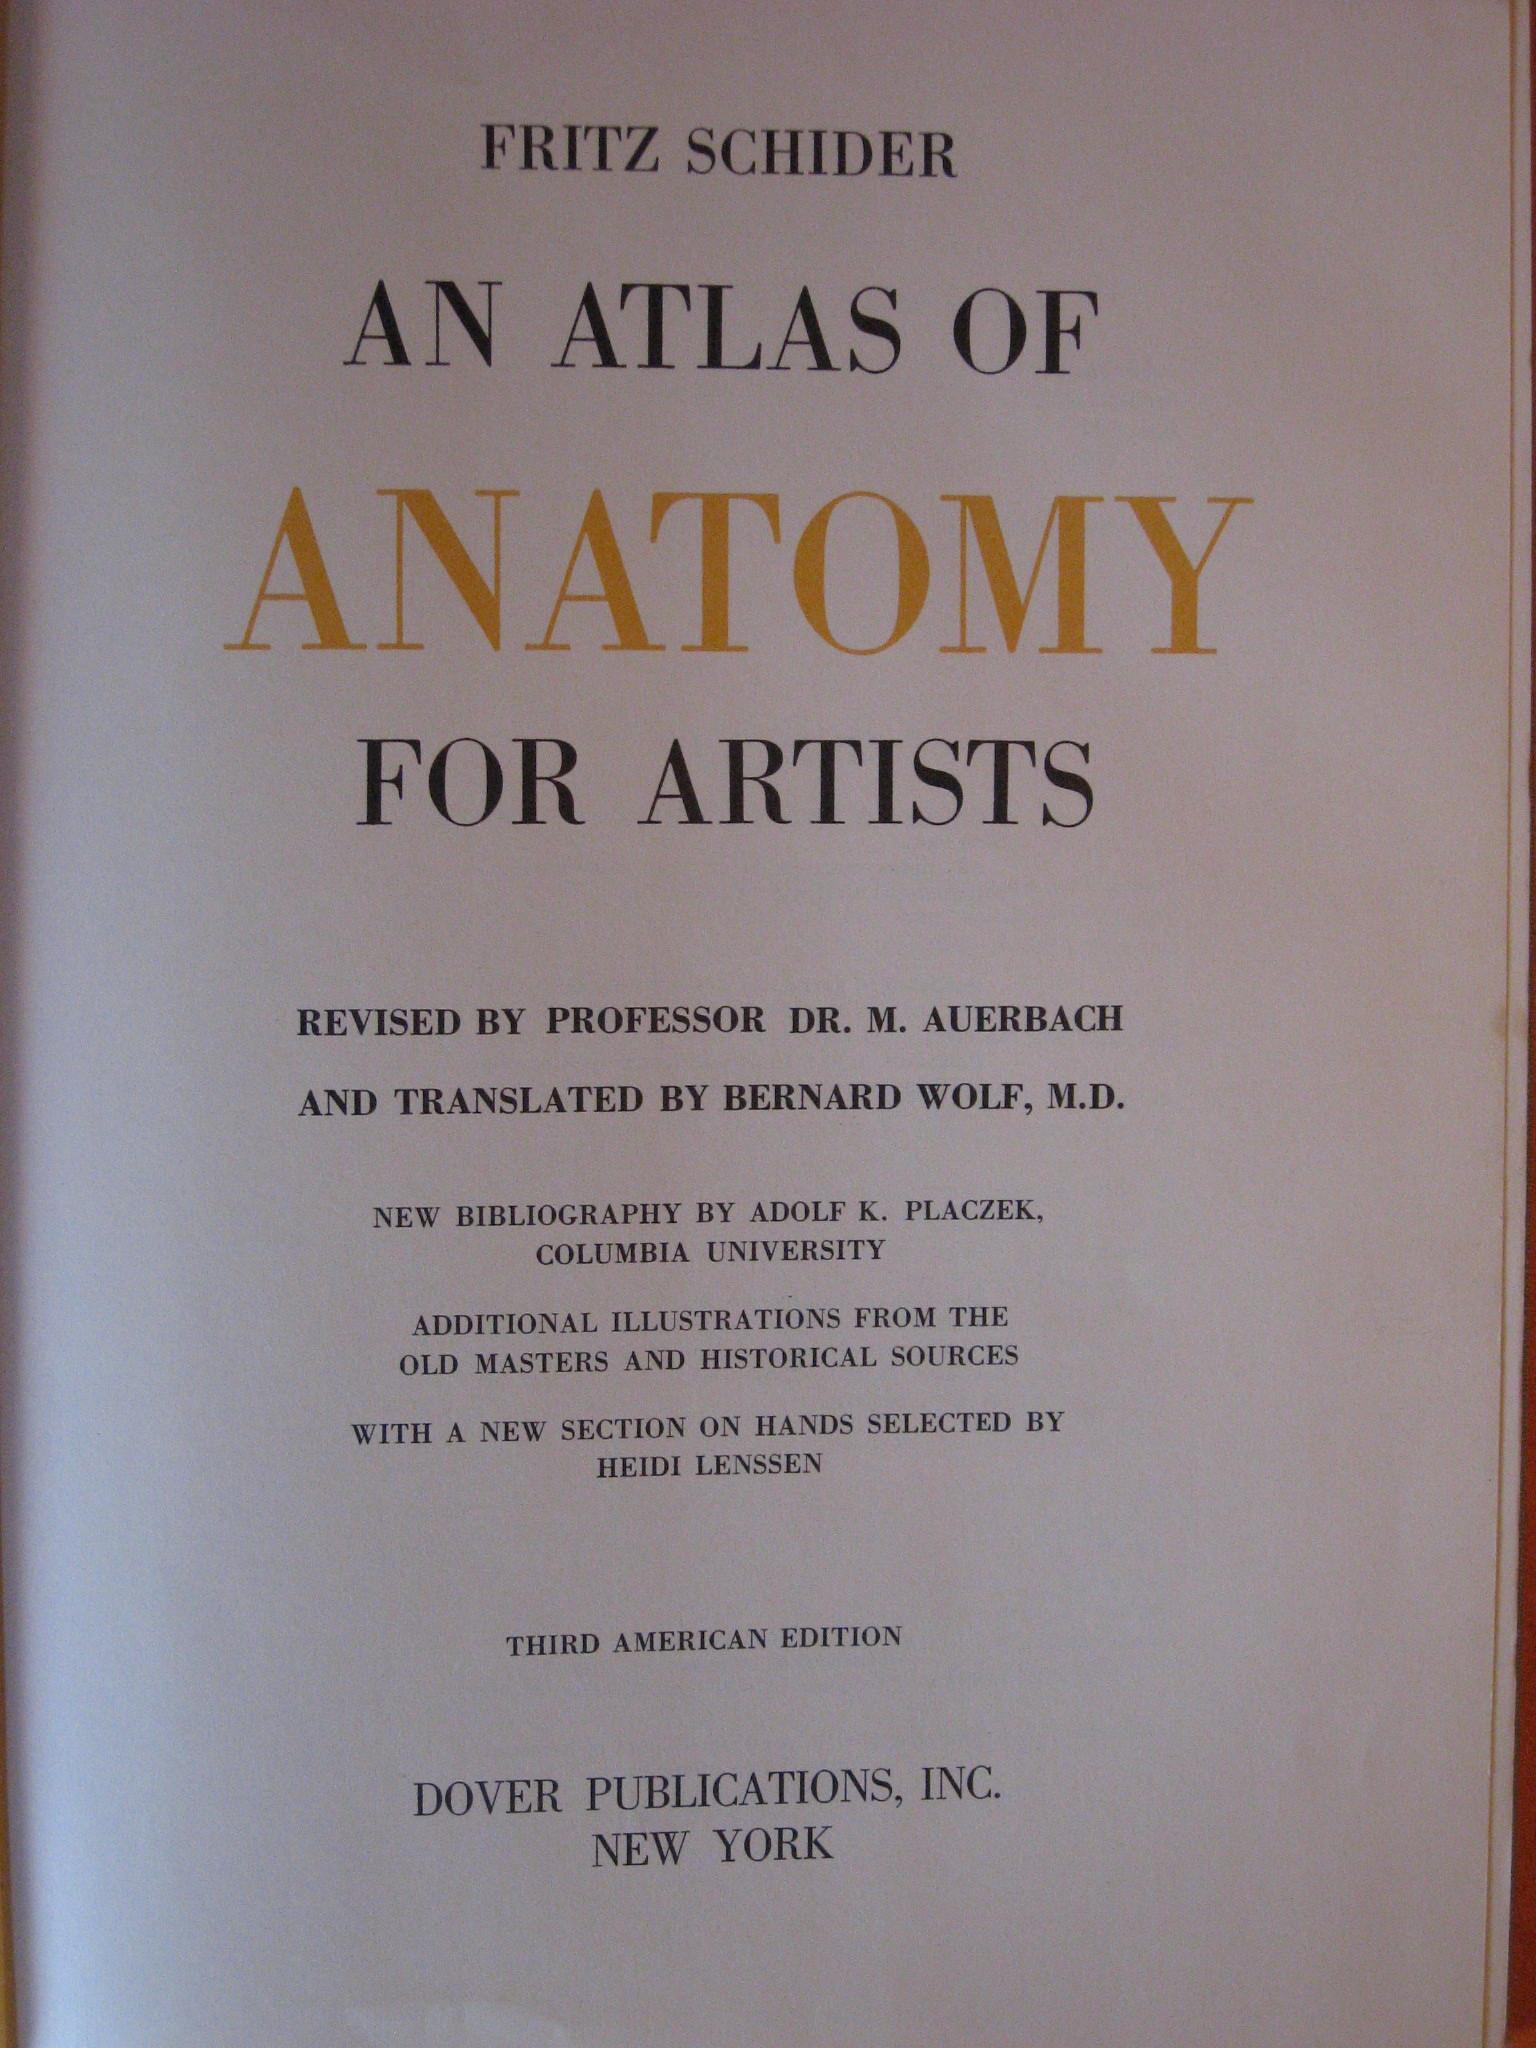 An Atlas of Anatomy for Artists, Schider, Fritz